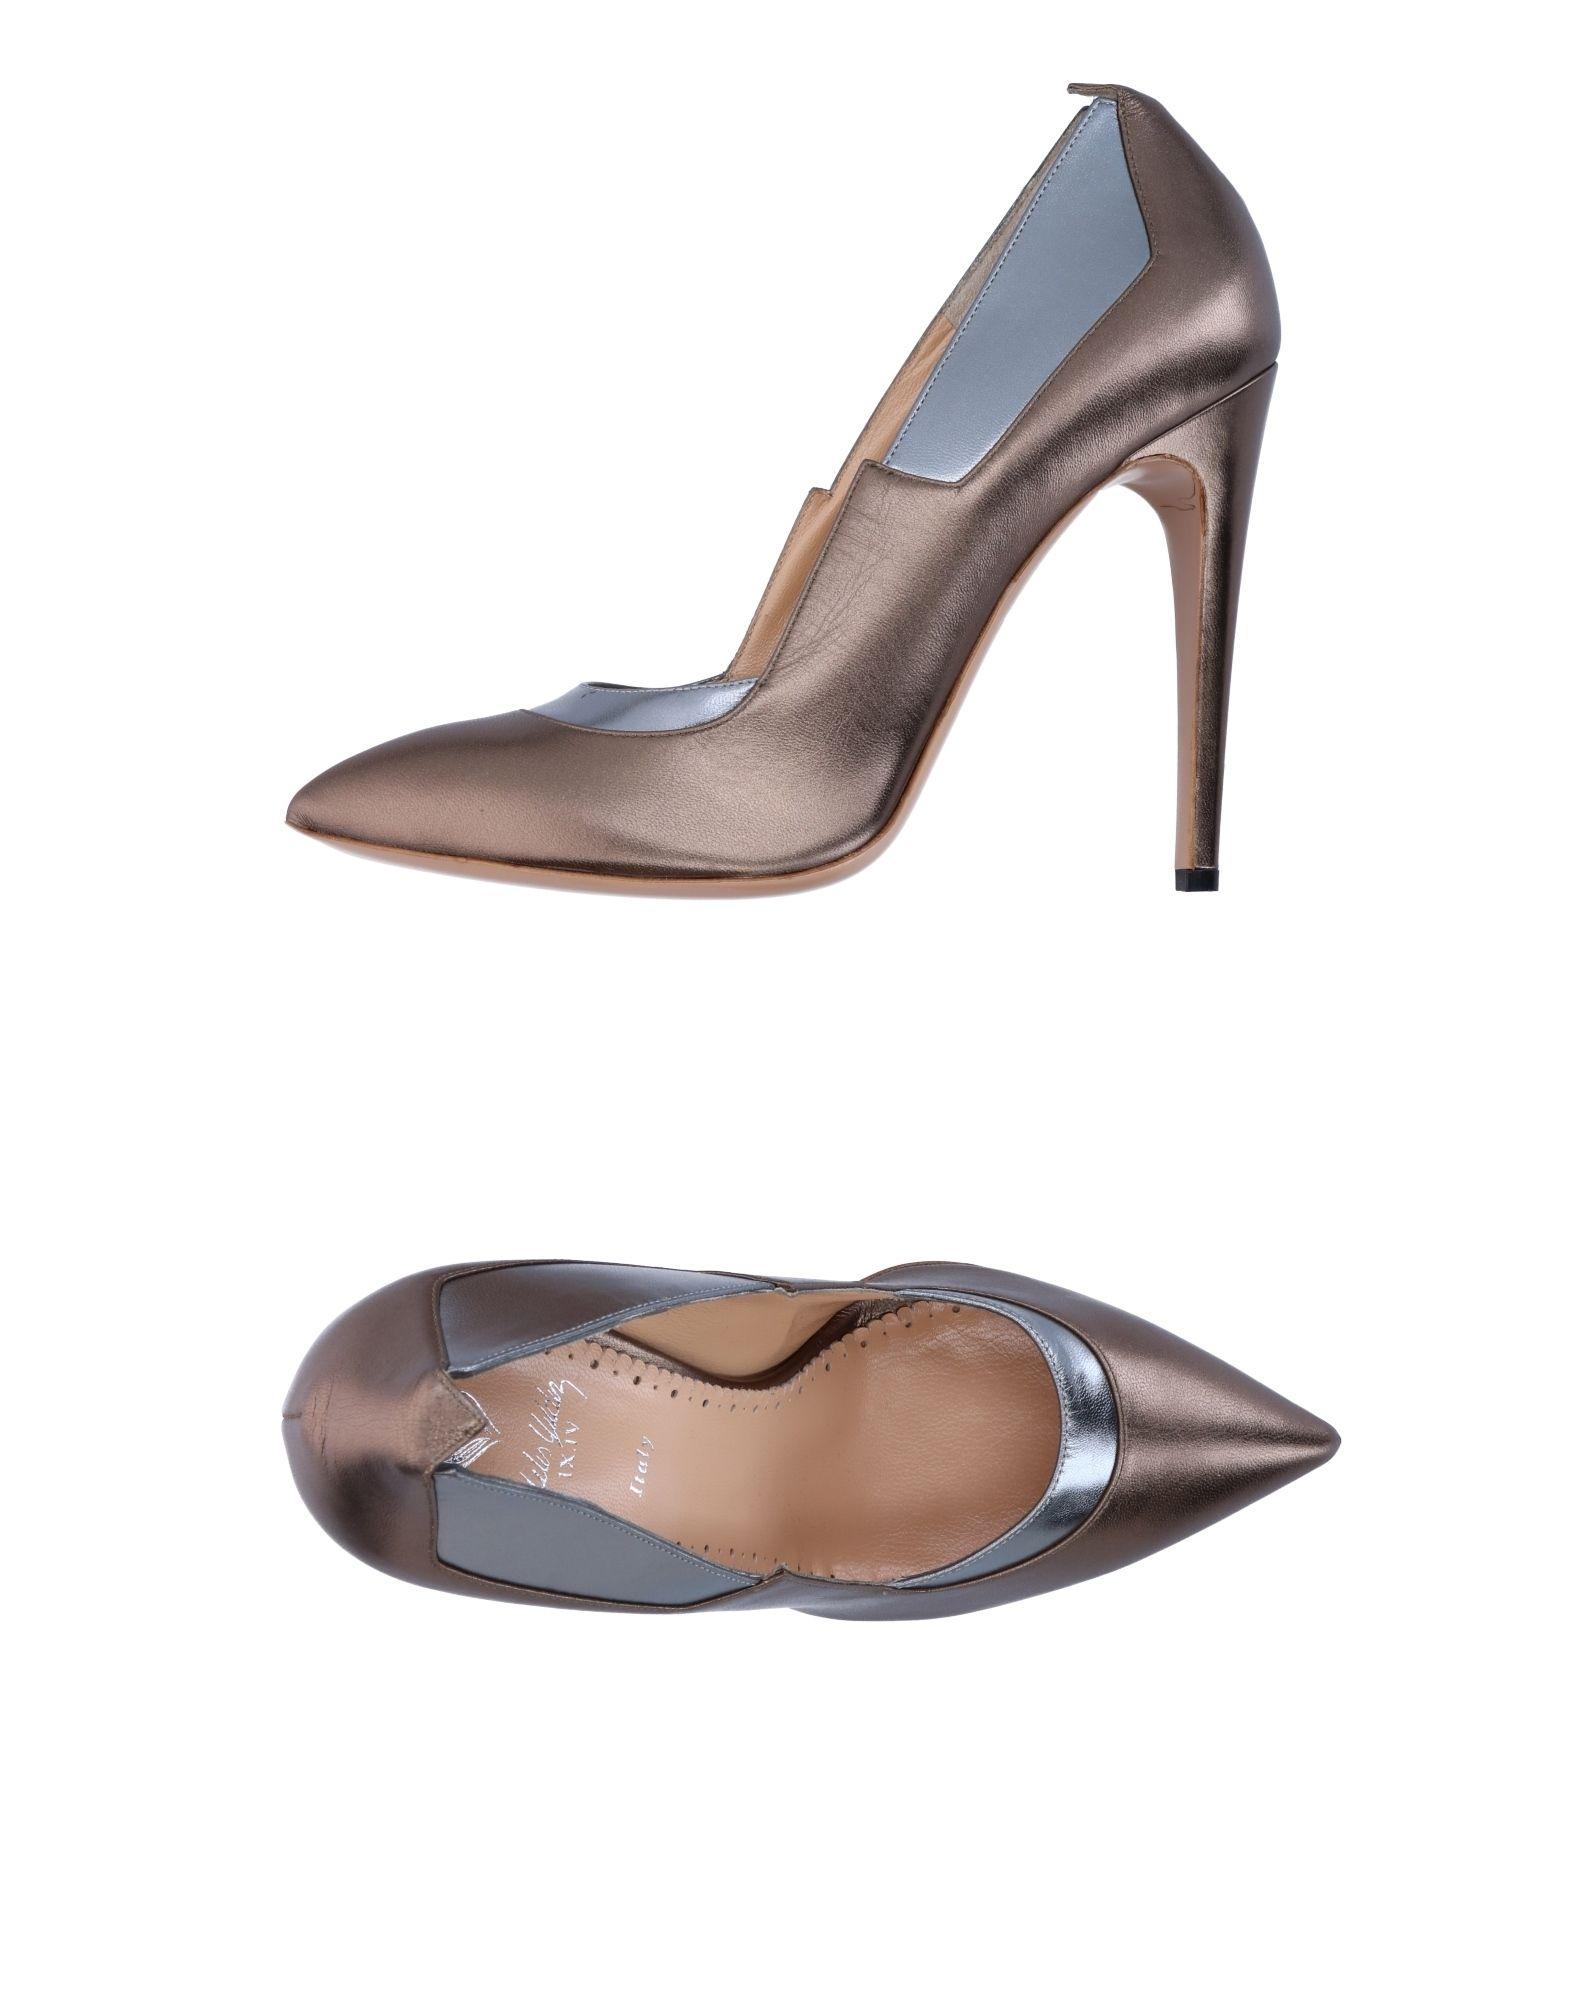 Stilvolle billige Schuhe Melis Yildiz Ix.Iv Pumps Damen  11272238XS